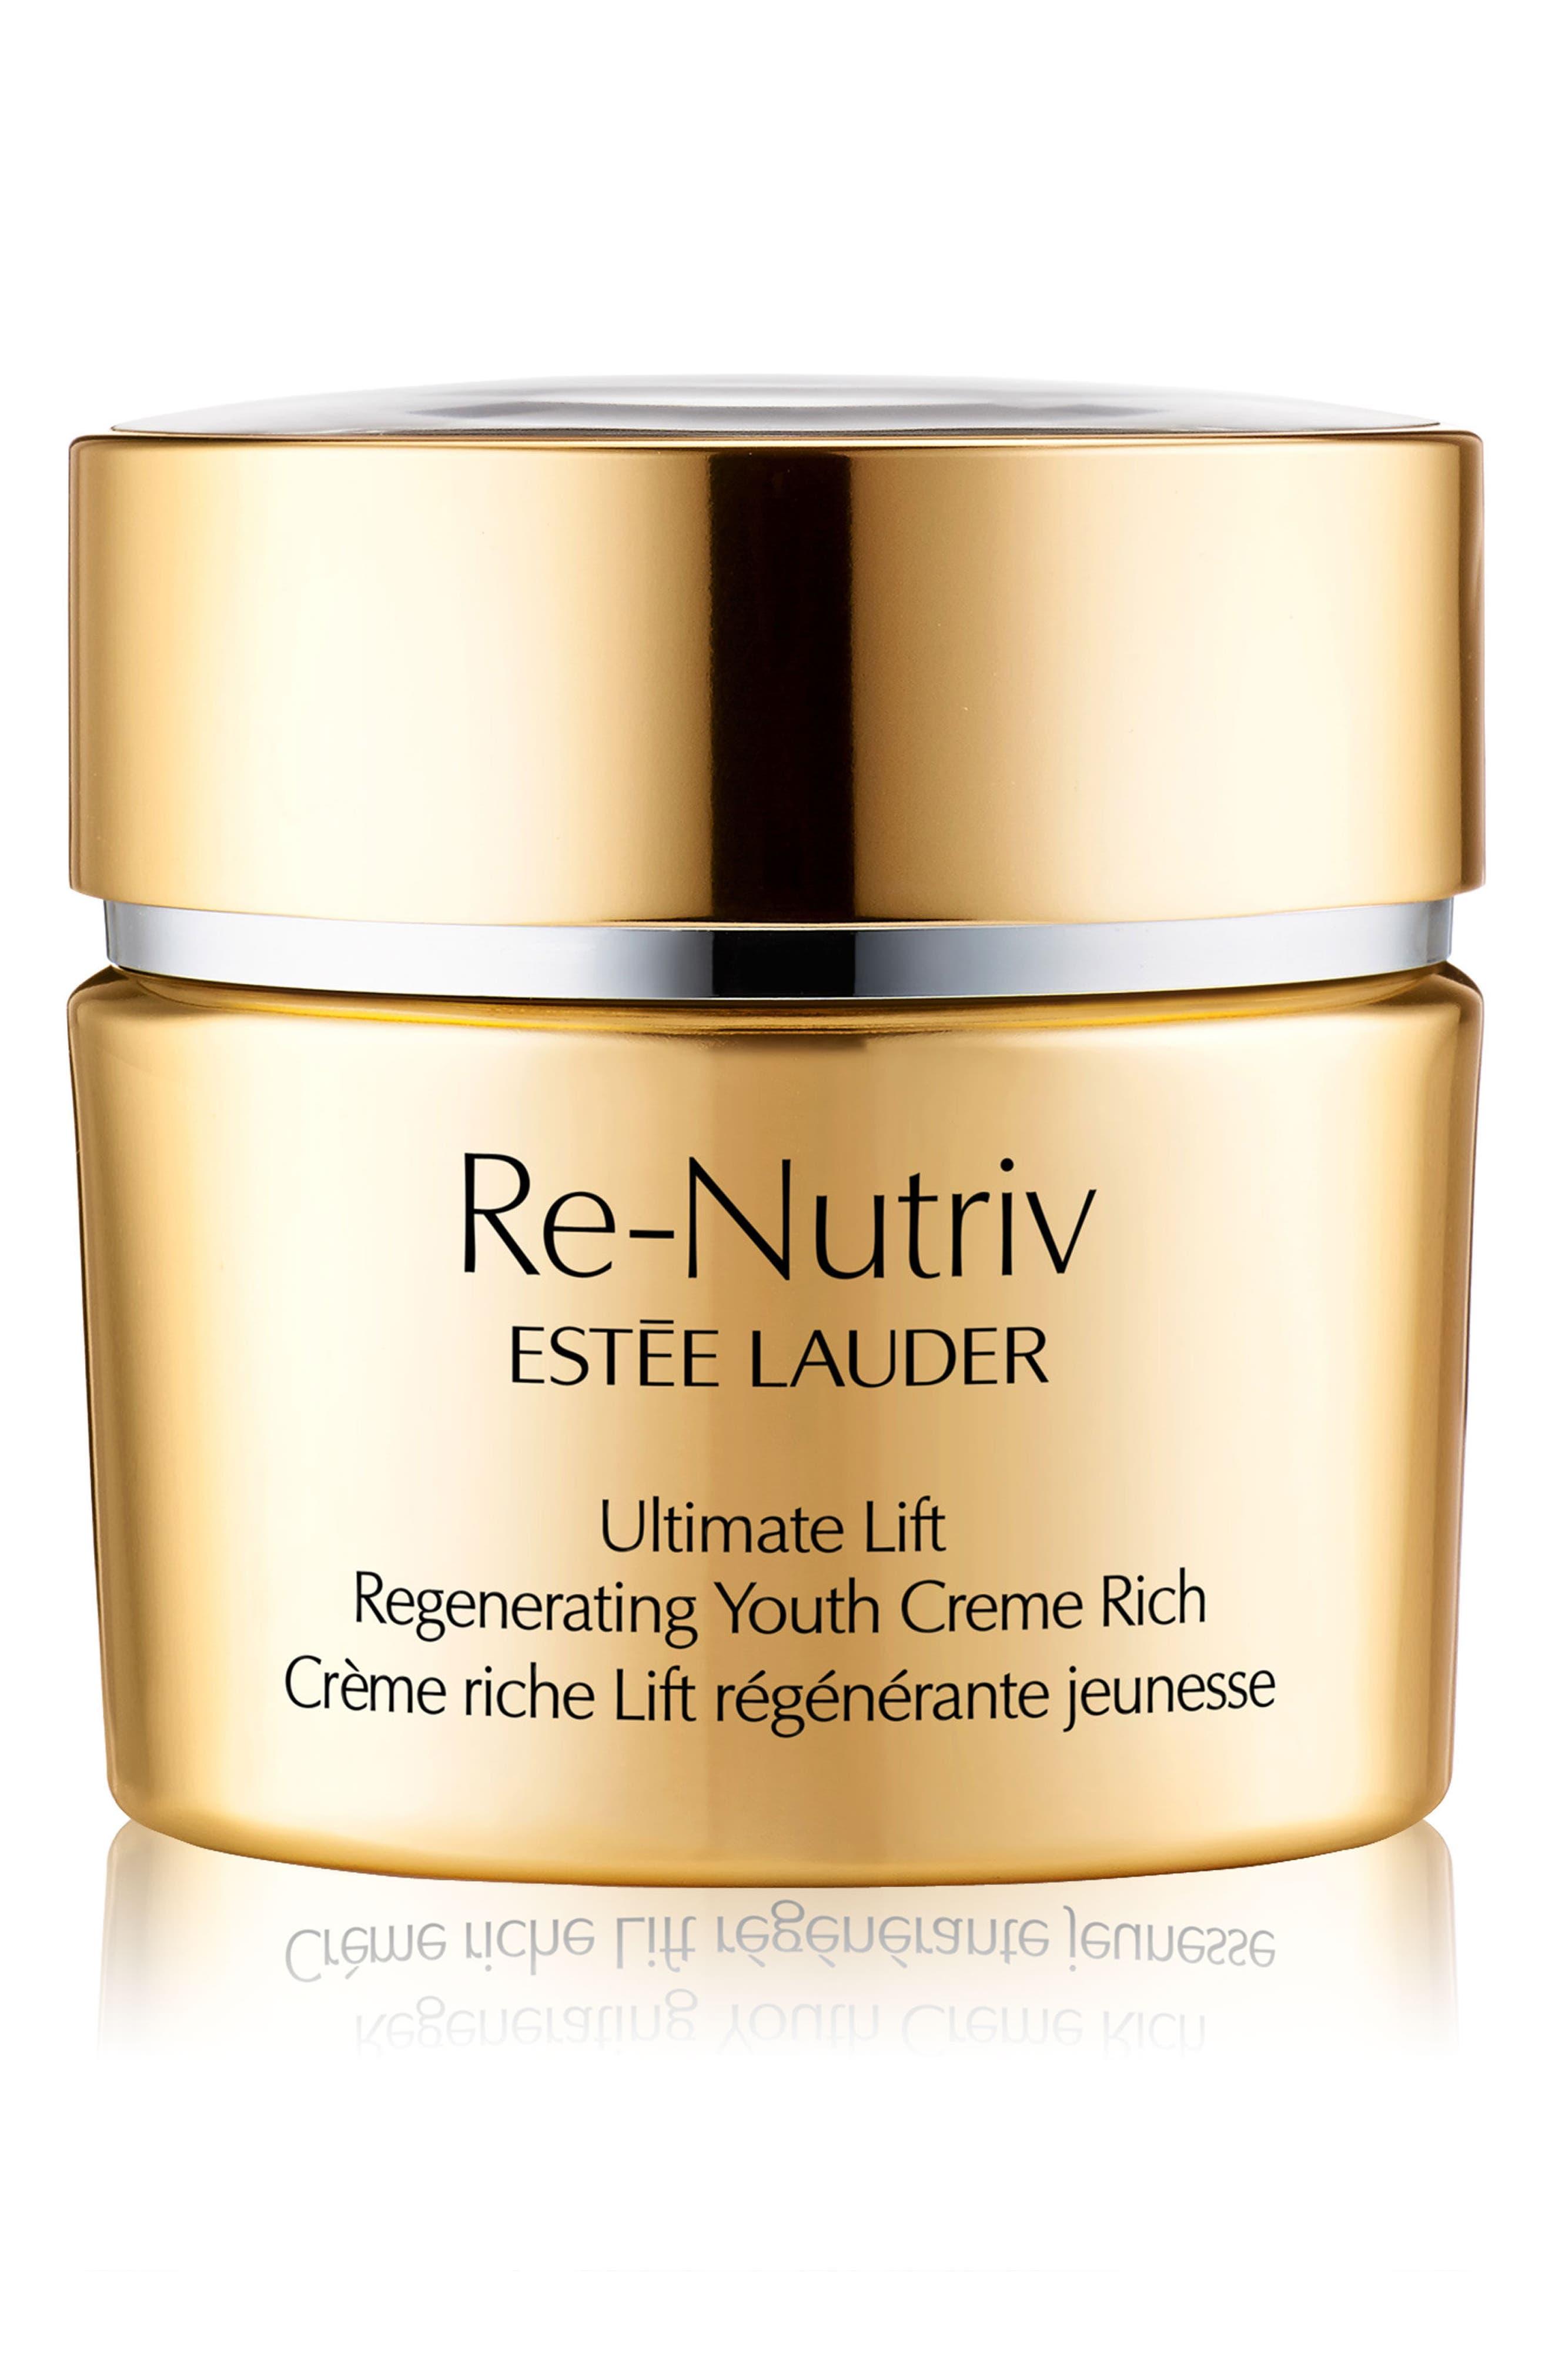 Re-Nutriv Ultimate Lift Regenerating Youth Creme Rich Eye Cream